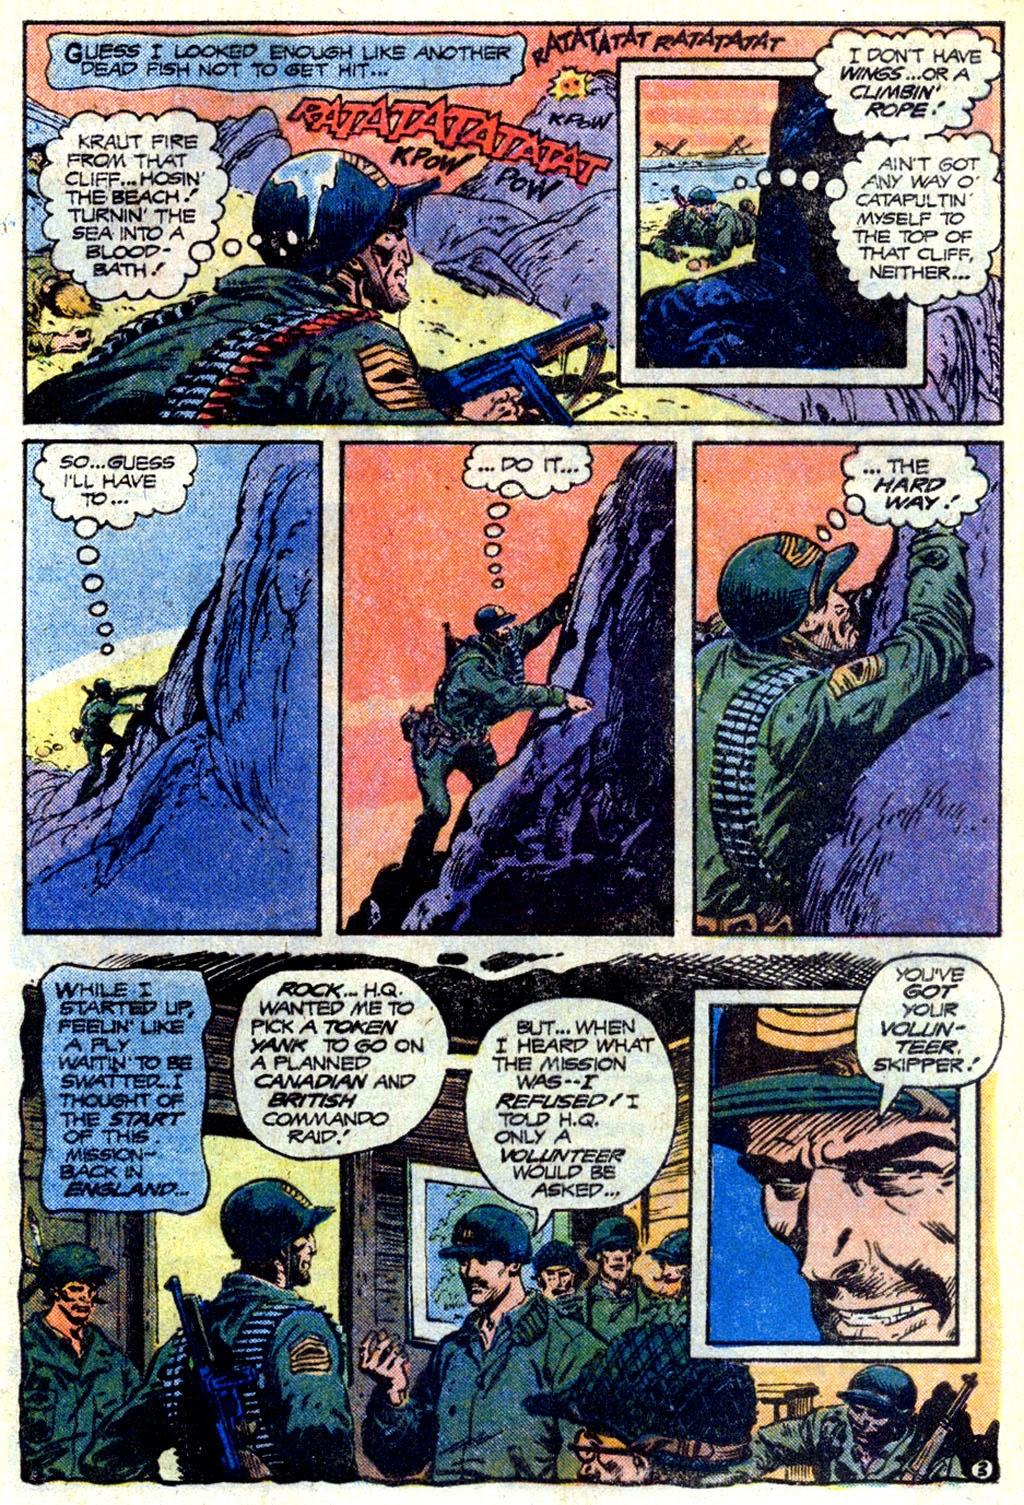 Read online Sgt. Rock comic -  Issue #339 - 4